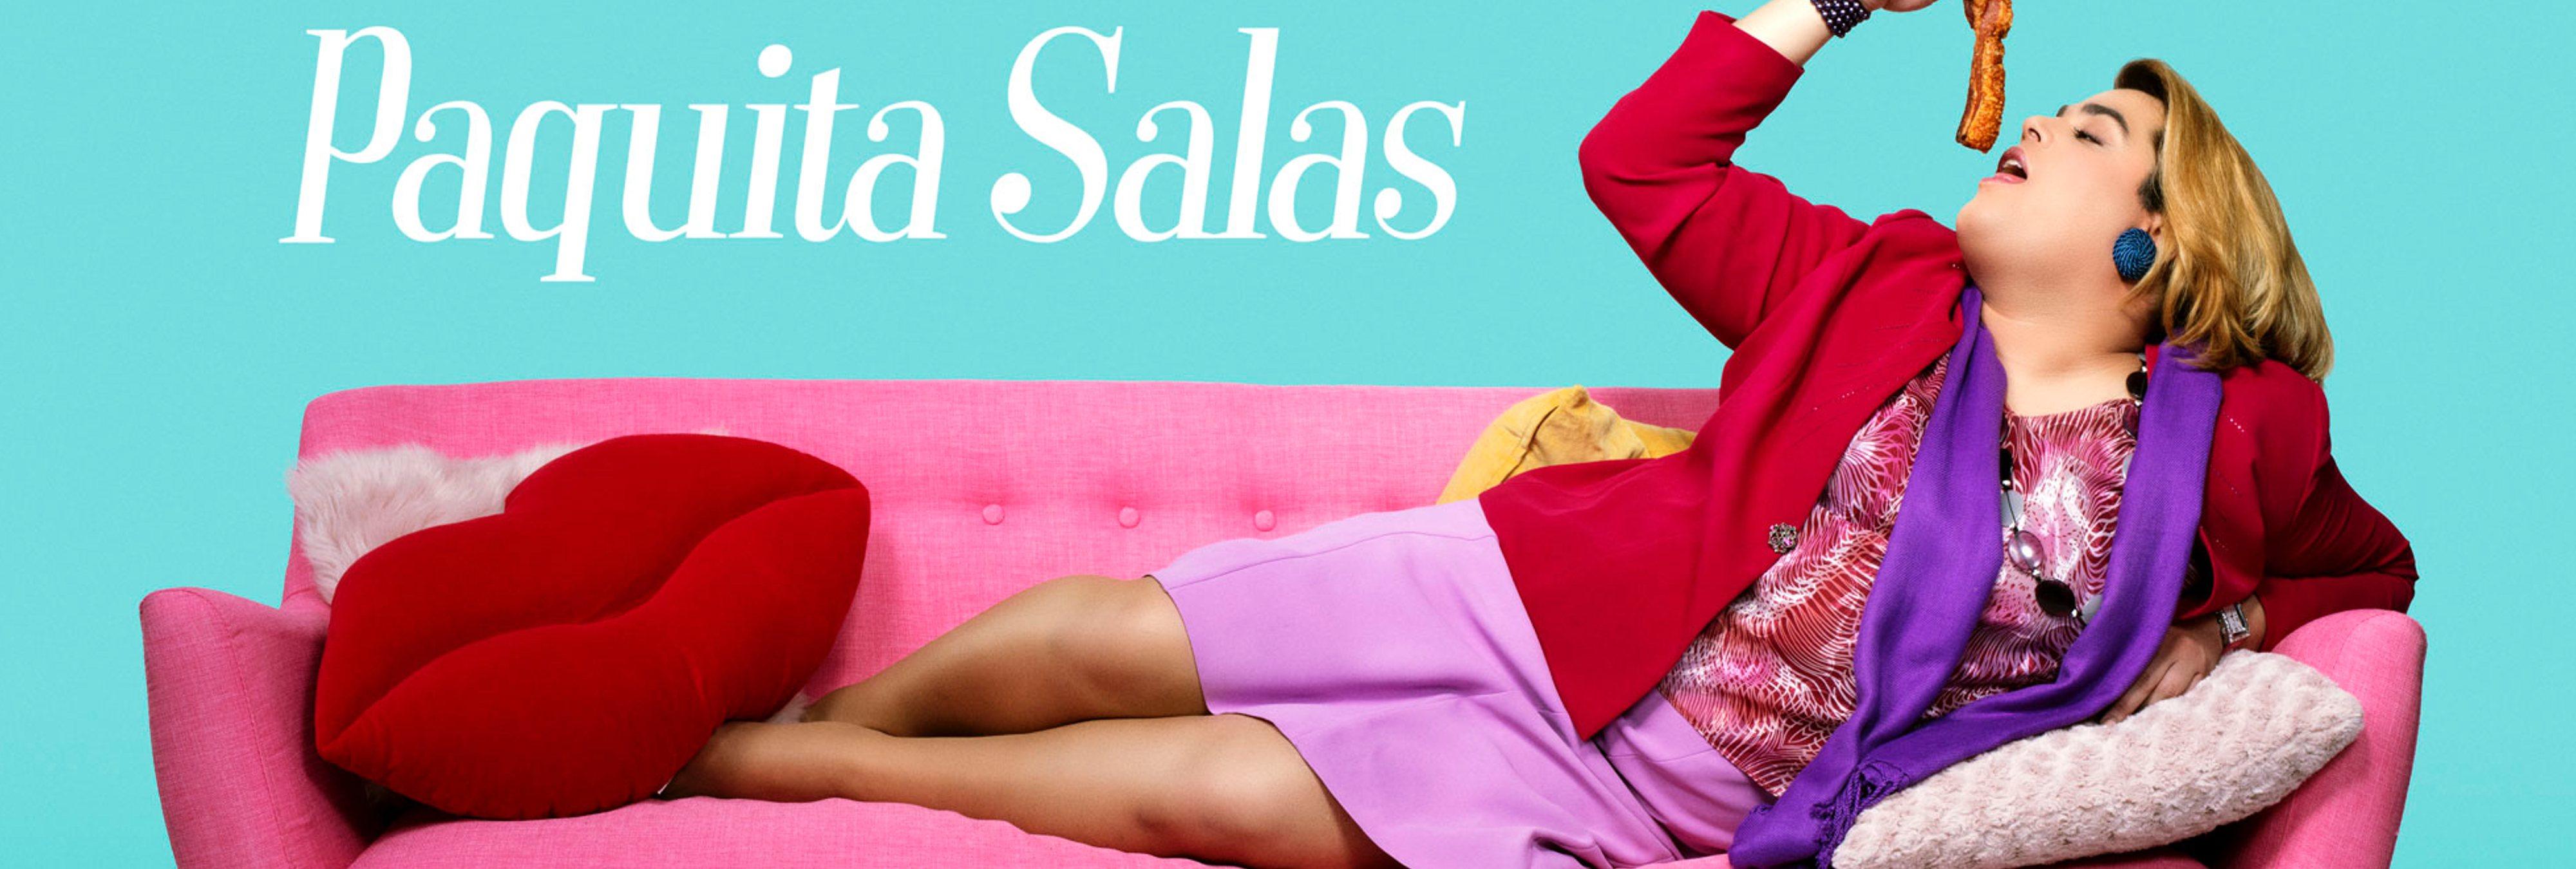 9 grandes frases de Paquita Salas